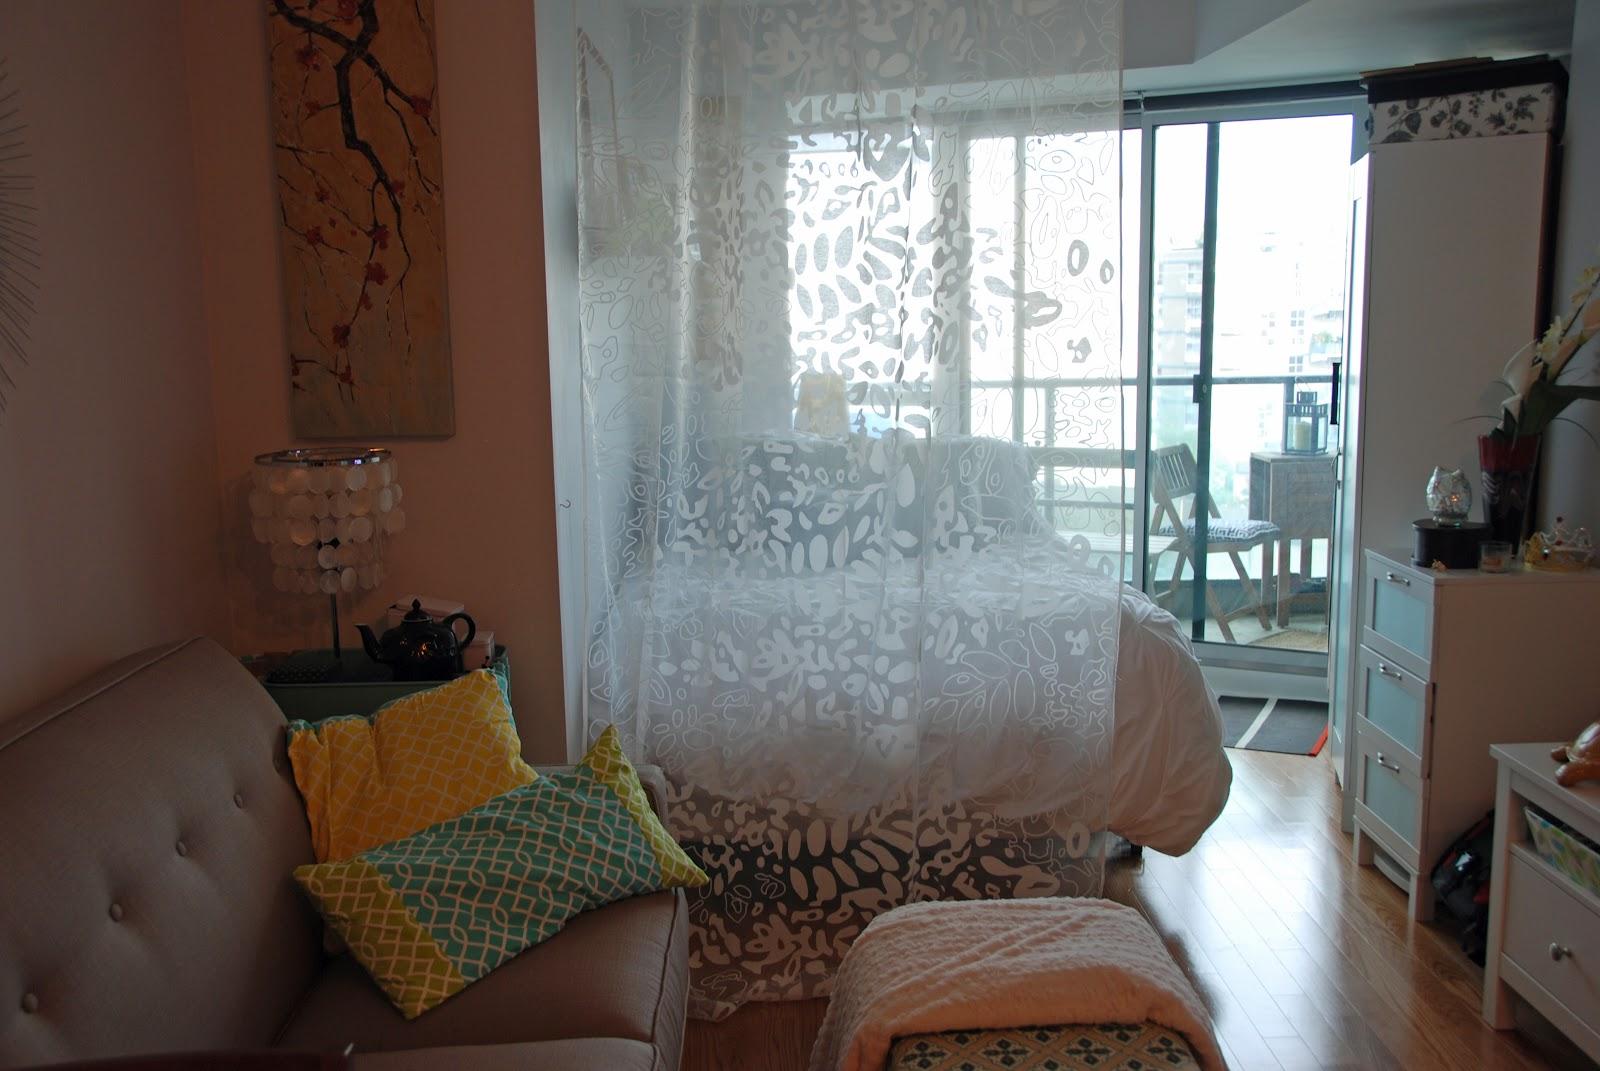 Ikea panel curtains - Ikea Curtain Panels Emmie Kvist Ebay Ikea Curtain Panel Curtain Room Dividers Ikea Hanging Bead